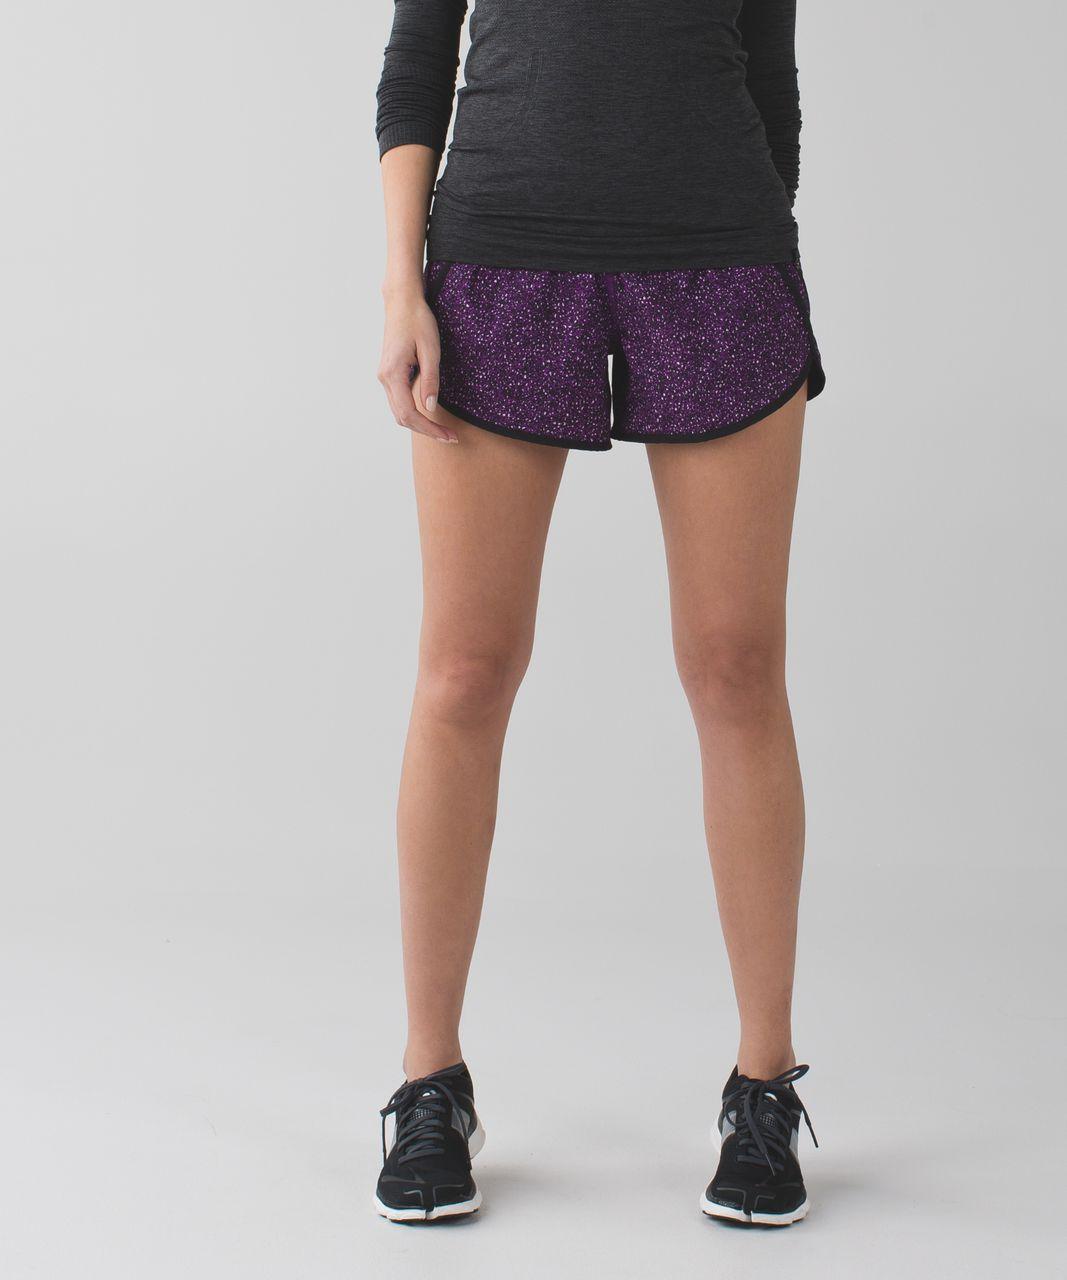 Lululemon Tracker Short III *4-way Stretch - Flashback Static Powered Rose Tender Violet / Black